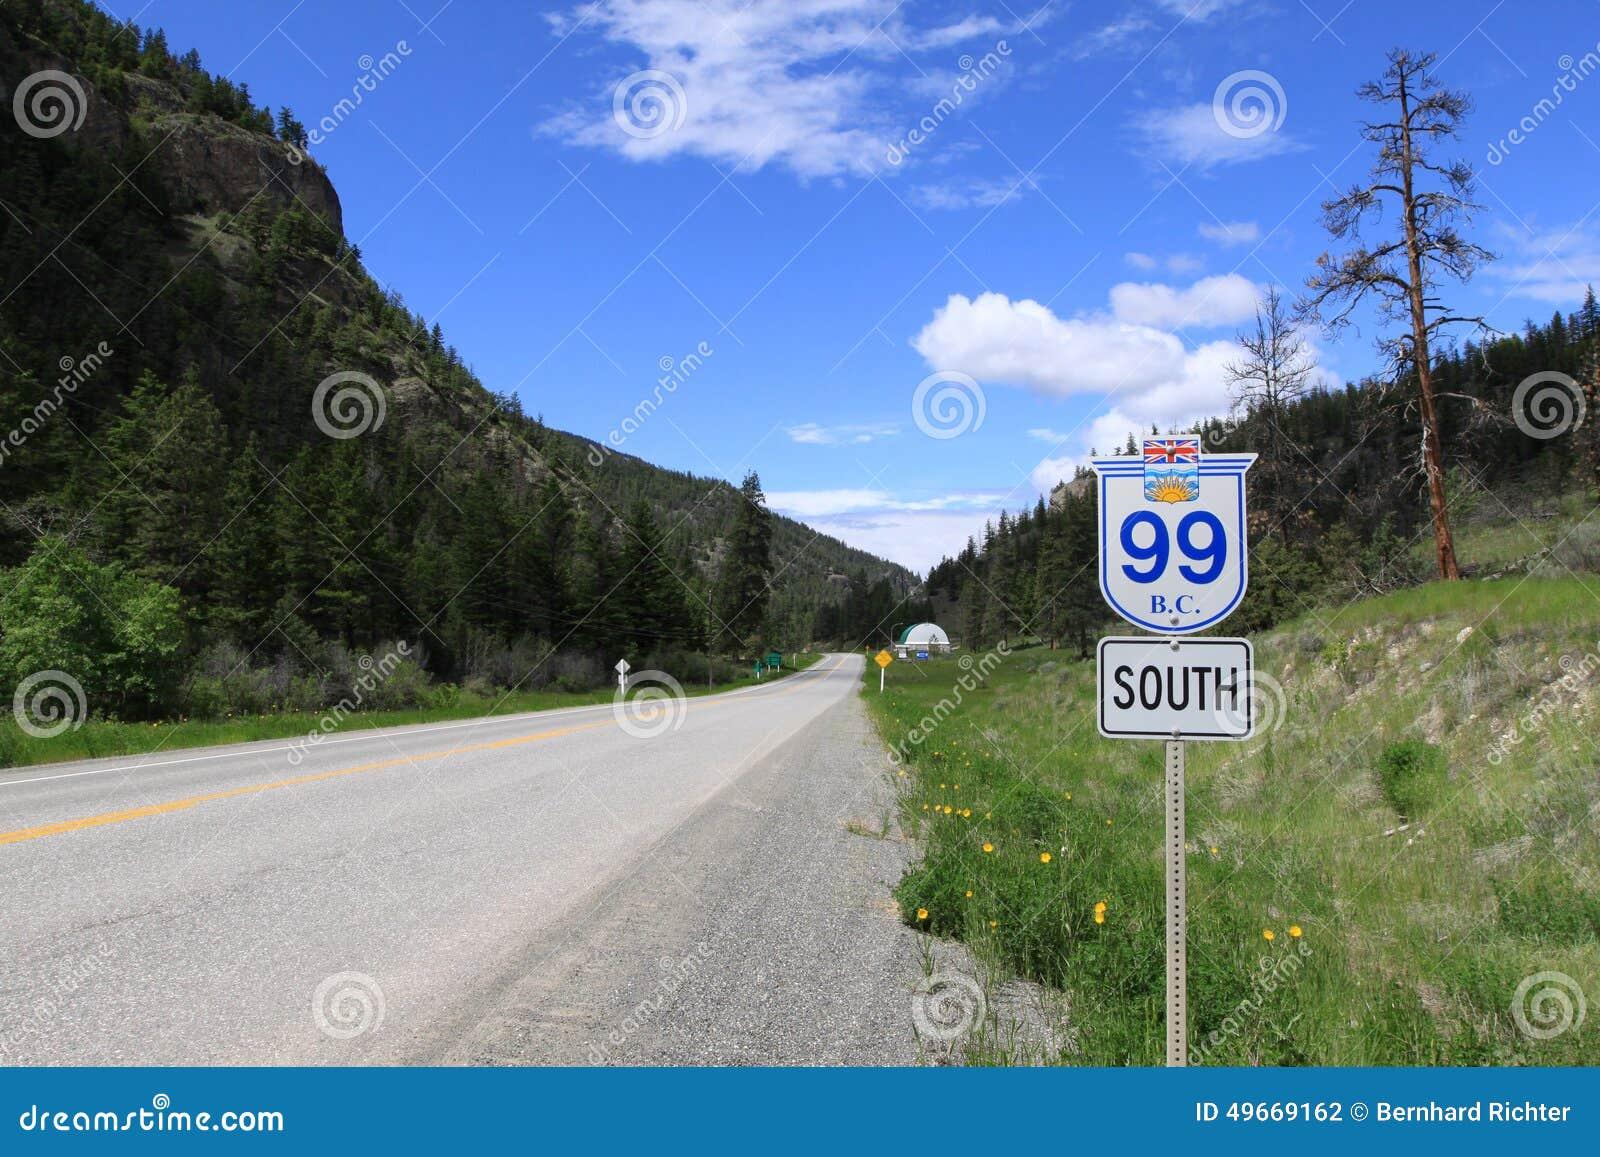 Highway 99 In British Columbia Canada